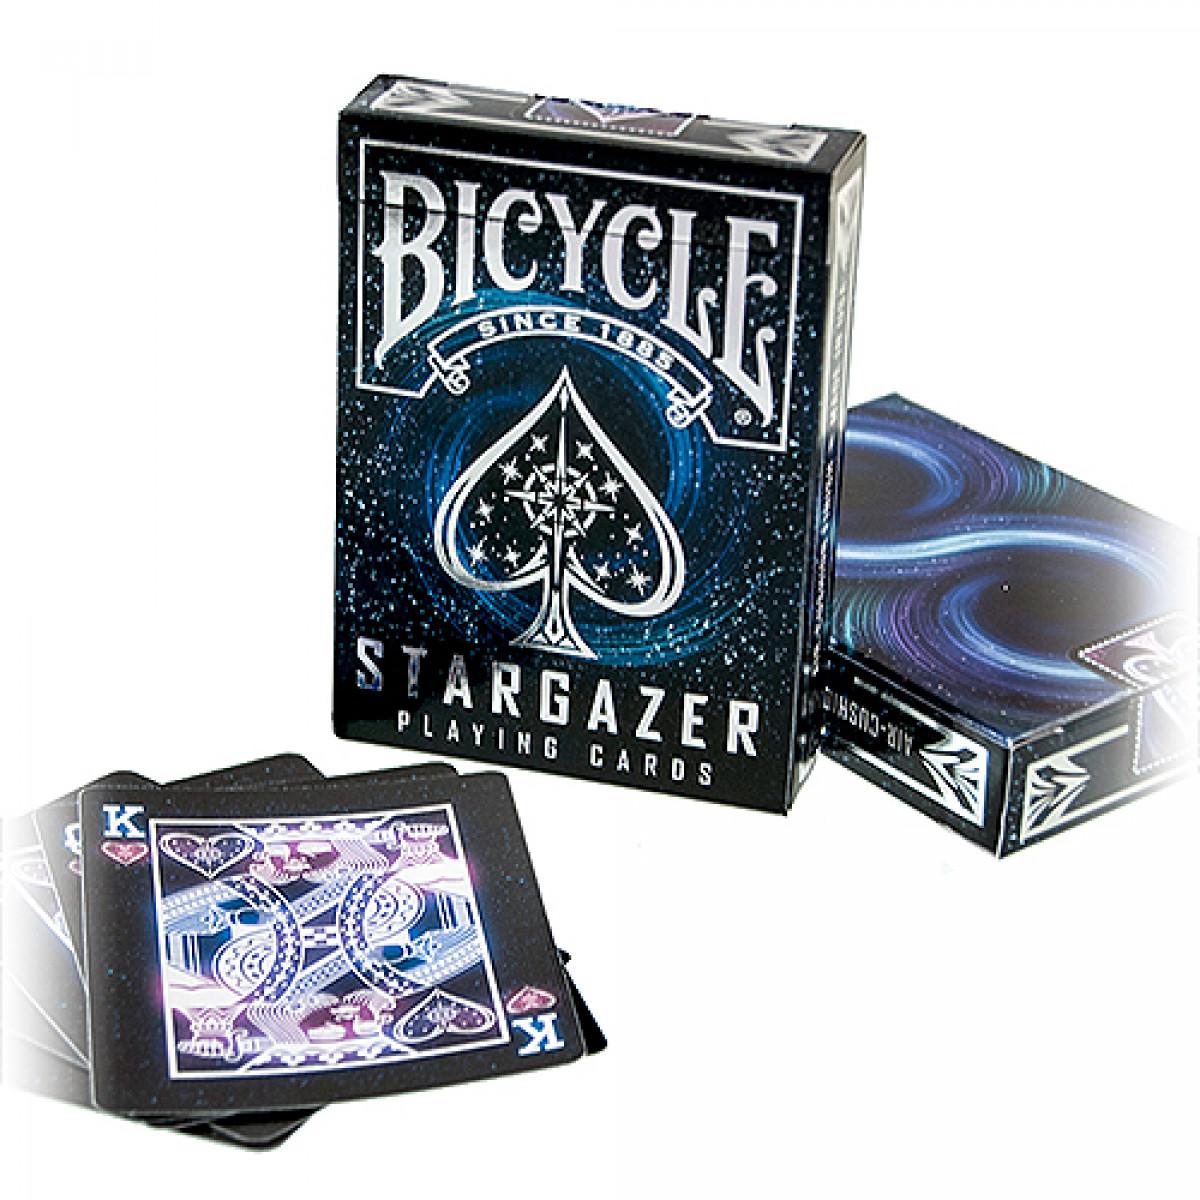 Assokappa La Magia 232 Qui Bicycle Stargazer